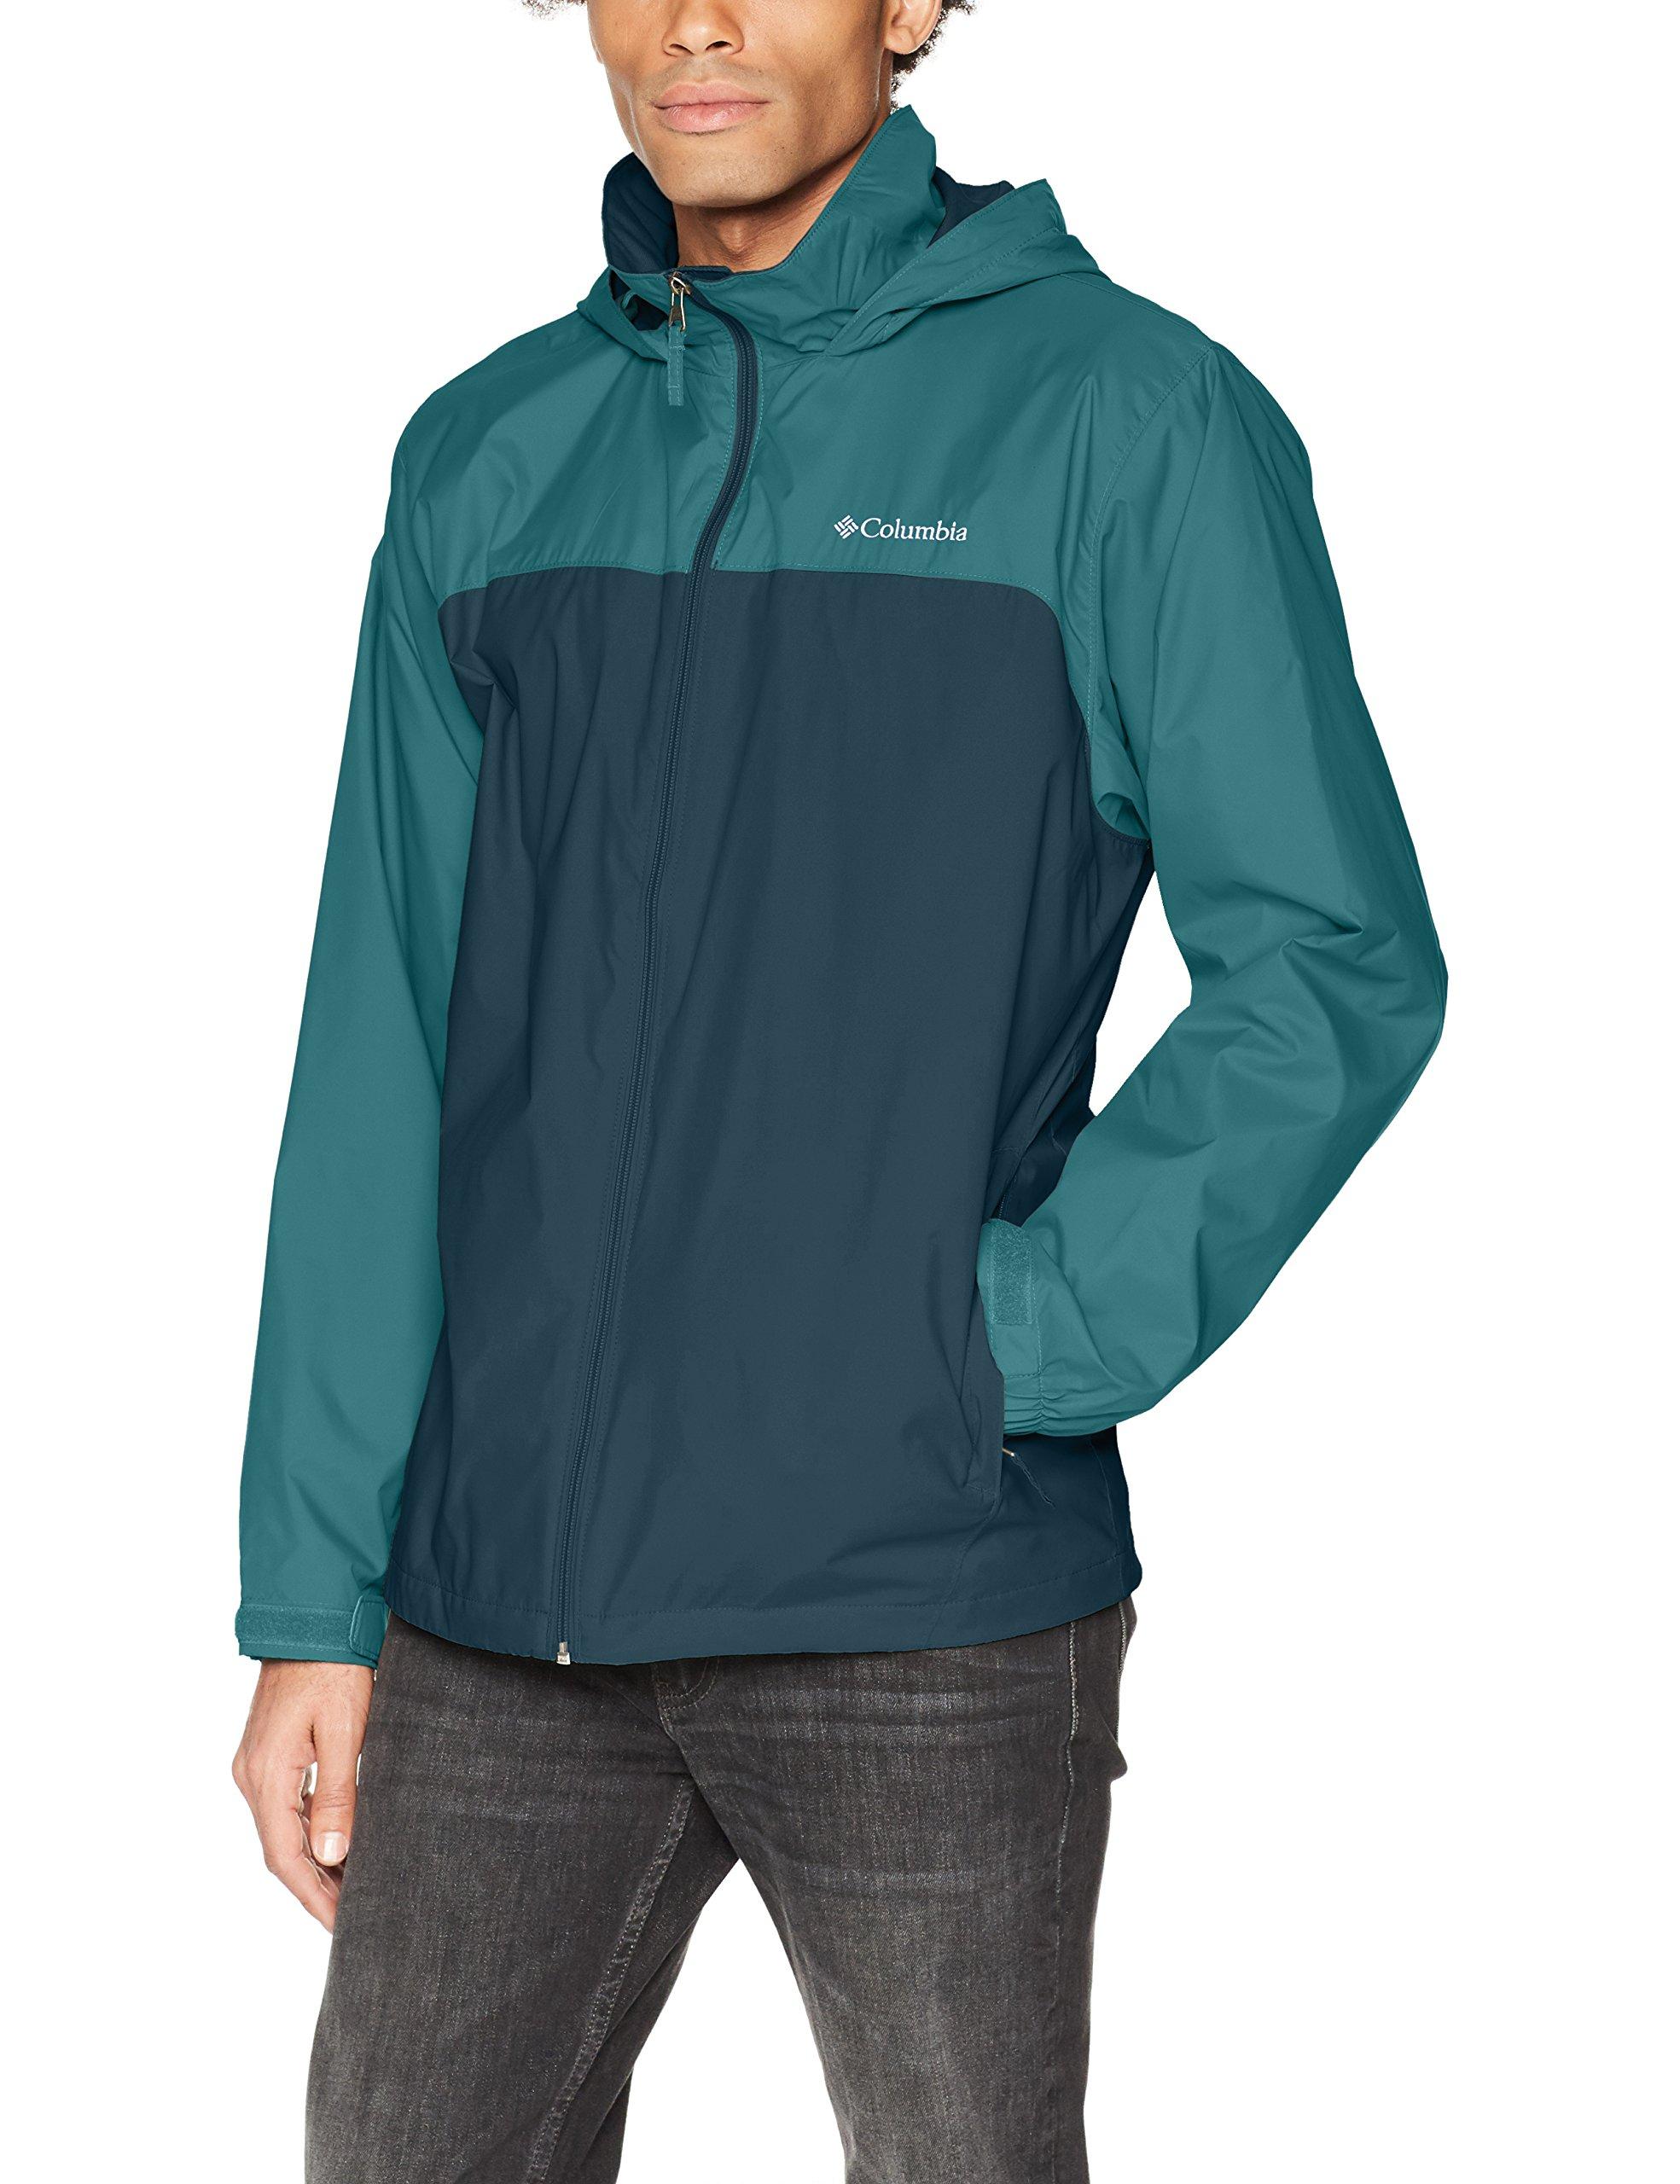 Columbia Men's Glennaker Lake Lined Rain Jacket, Night Shadow, Poseidon, M